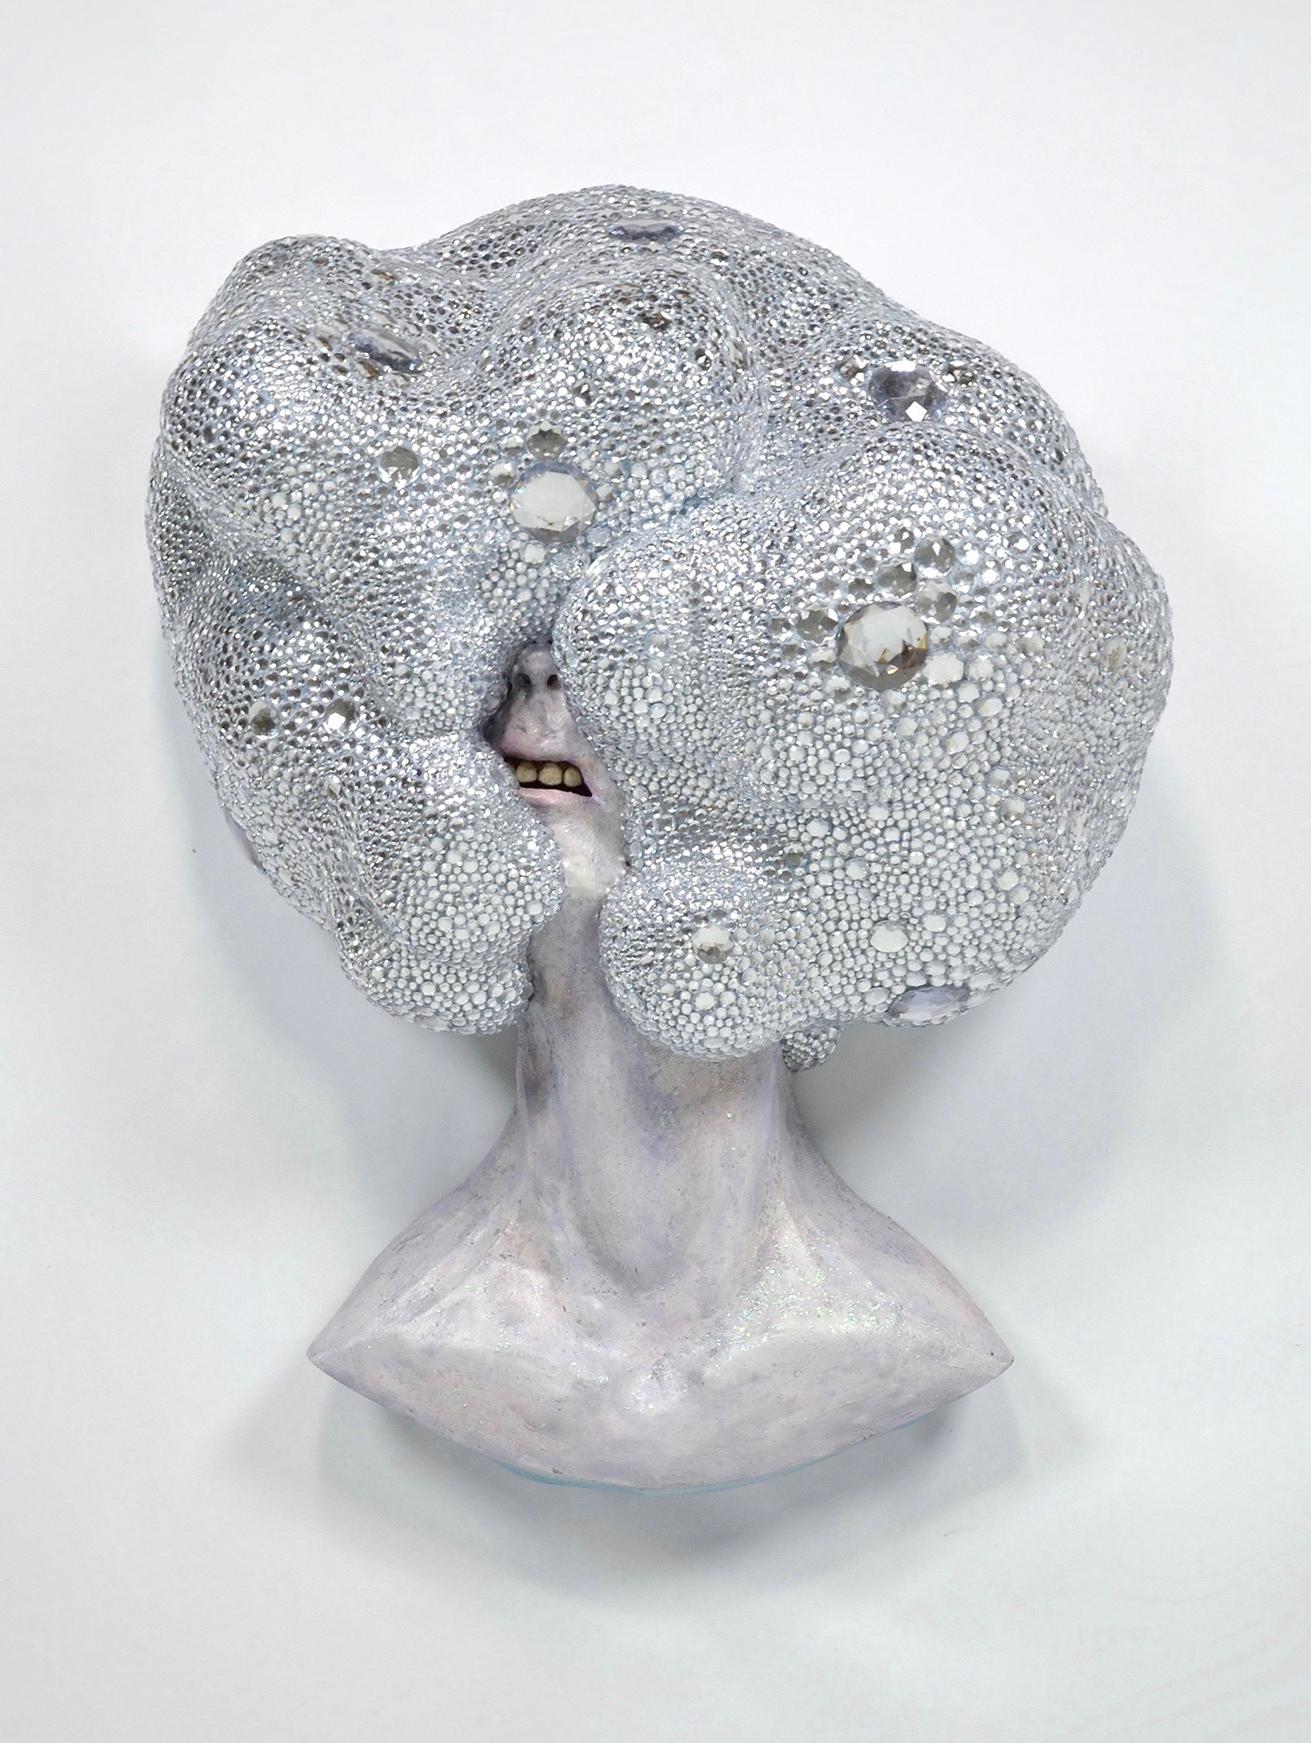 Big Hair #6 (Blinding)    ^5 stoneware, slip, 2 pounds of rhinestones, glitter, acrylic  36 x 27 x 15